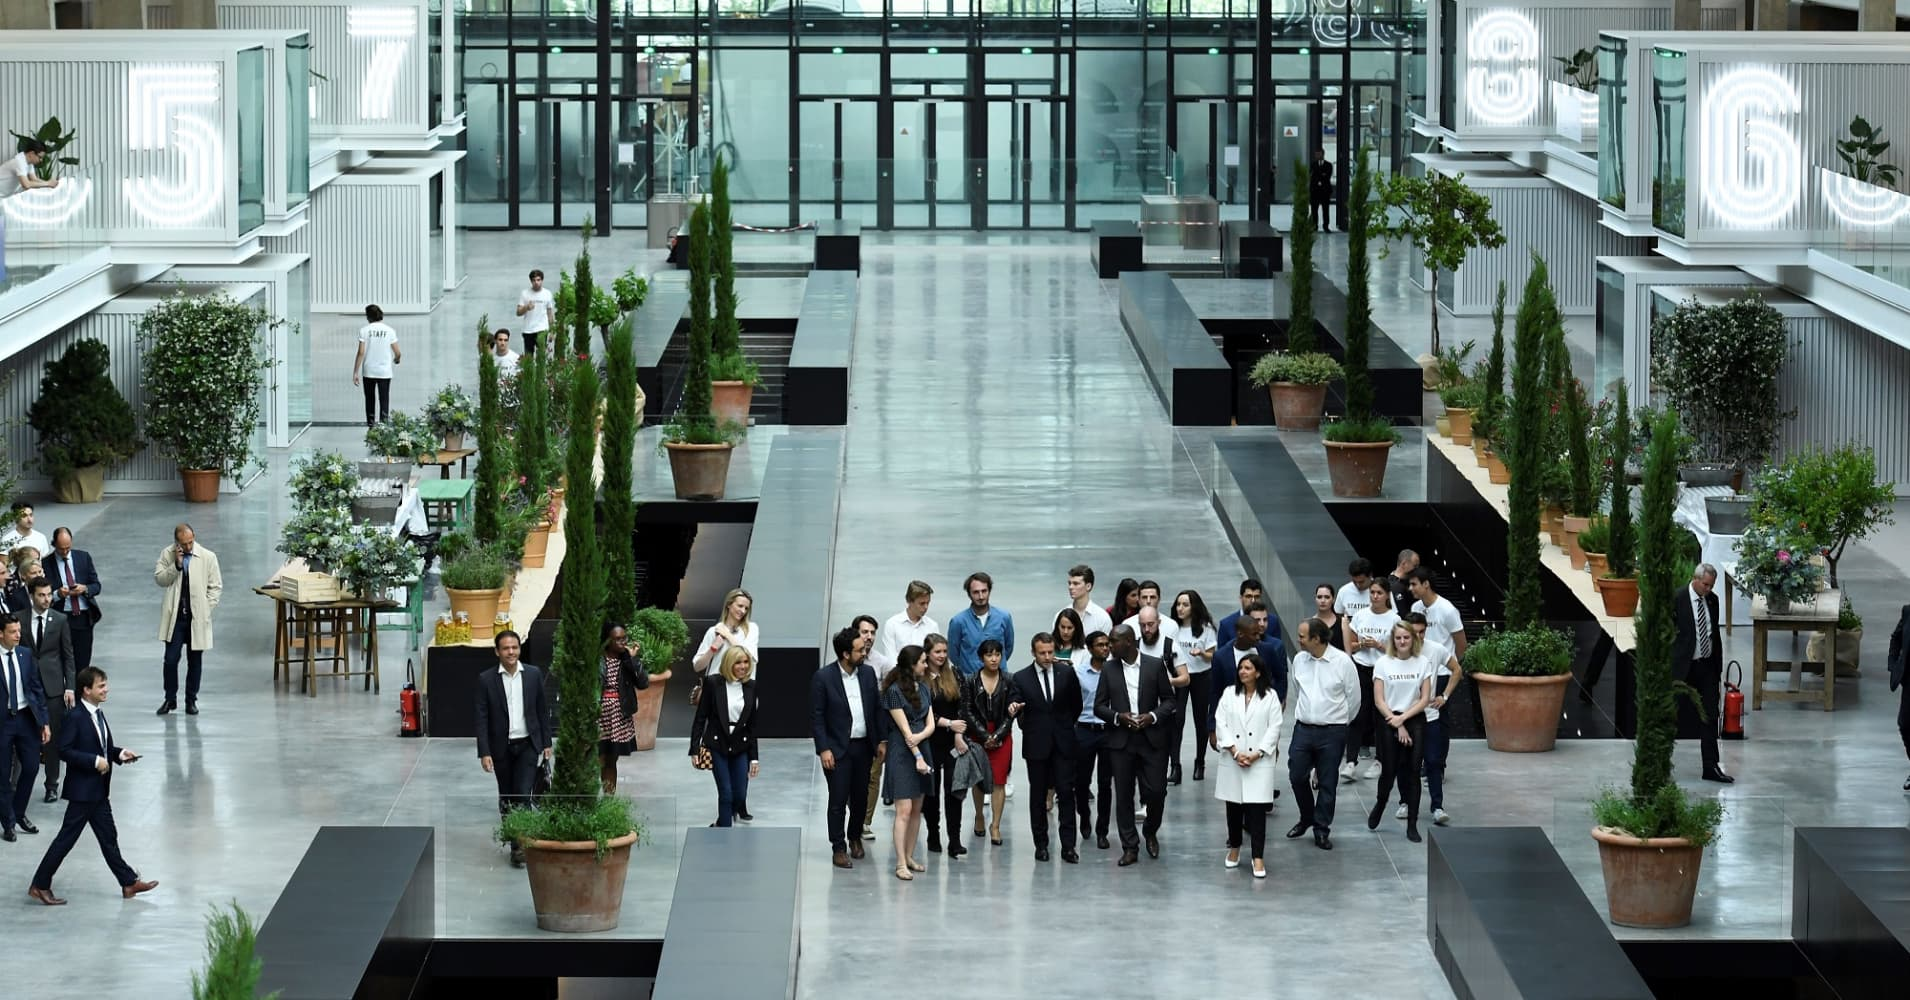 France's President Emmanuel Macron tours the world's biggest start-up incubator Station F